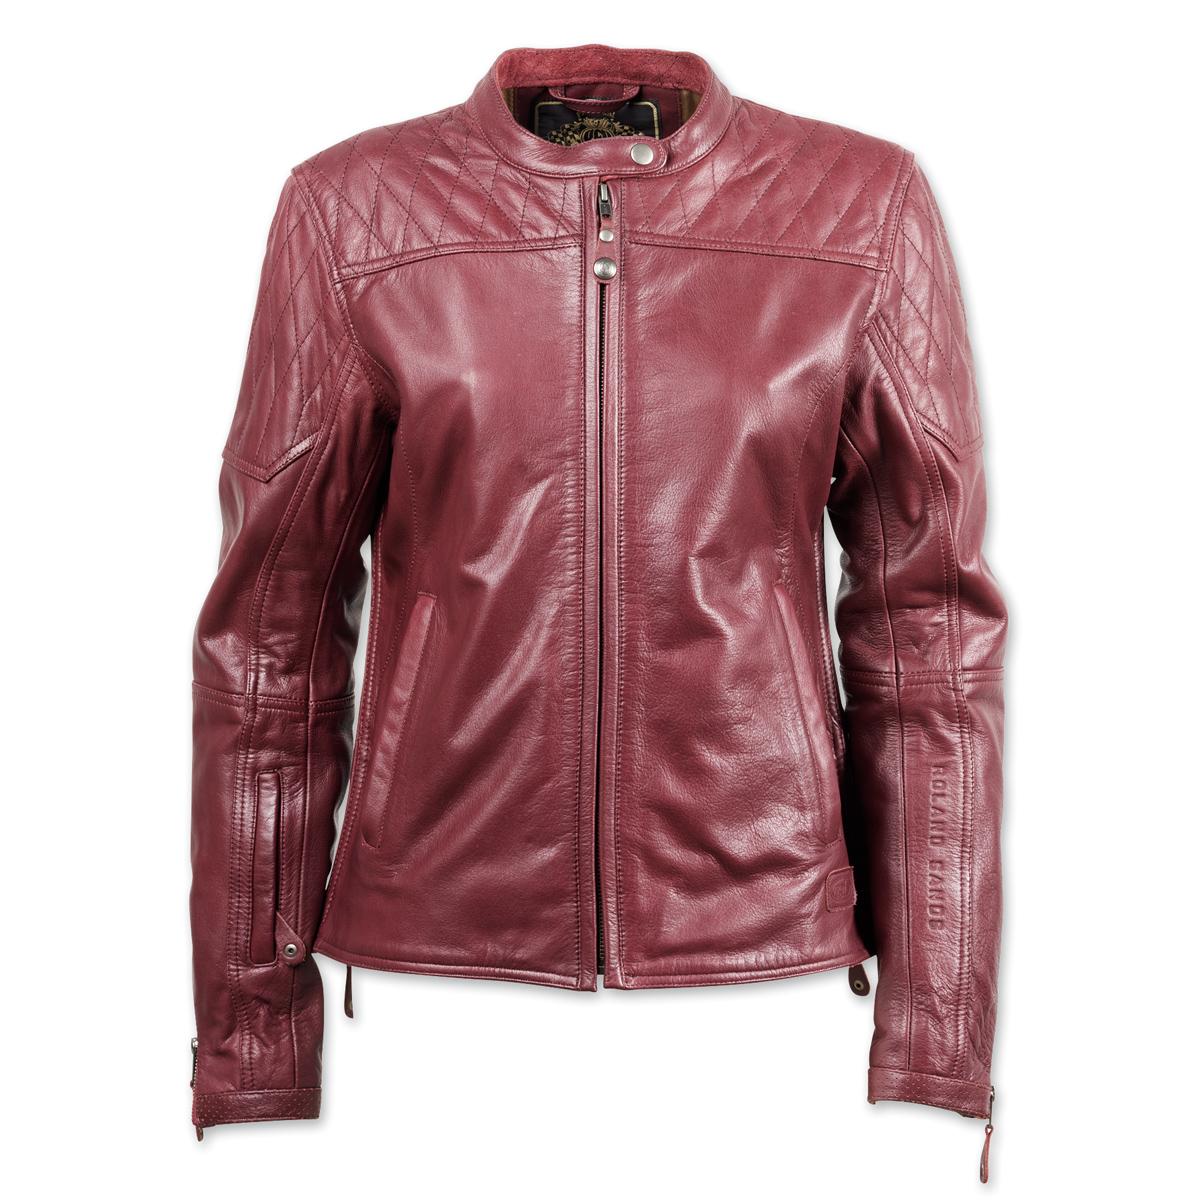 Roland Sands Design Women's Trinity Merlot Leather Jacket